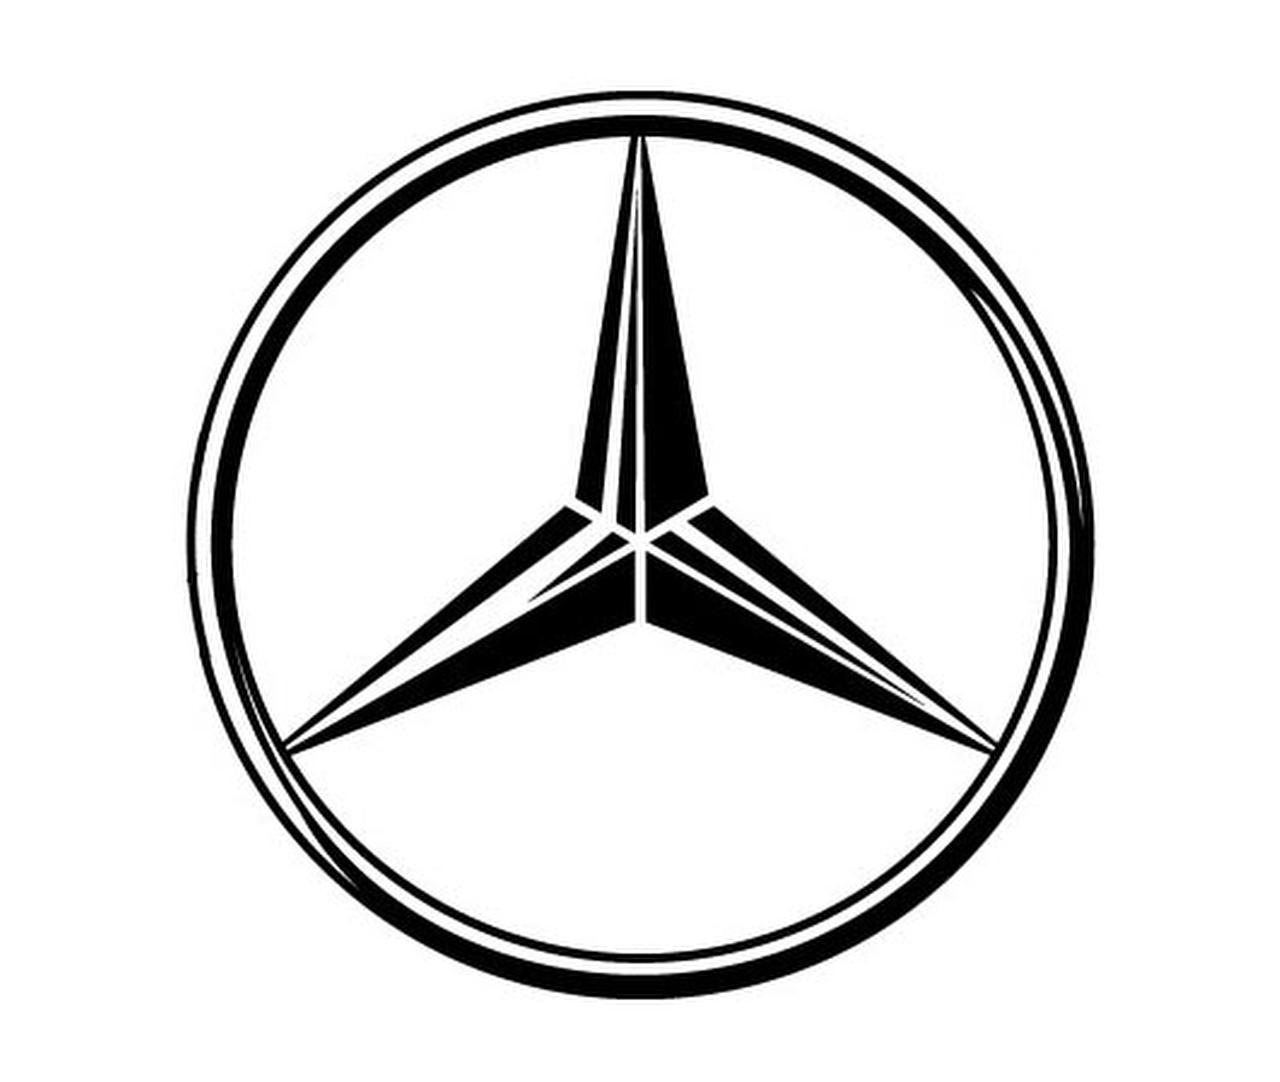 Benz mercedes sign